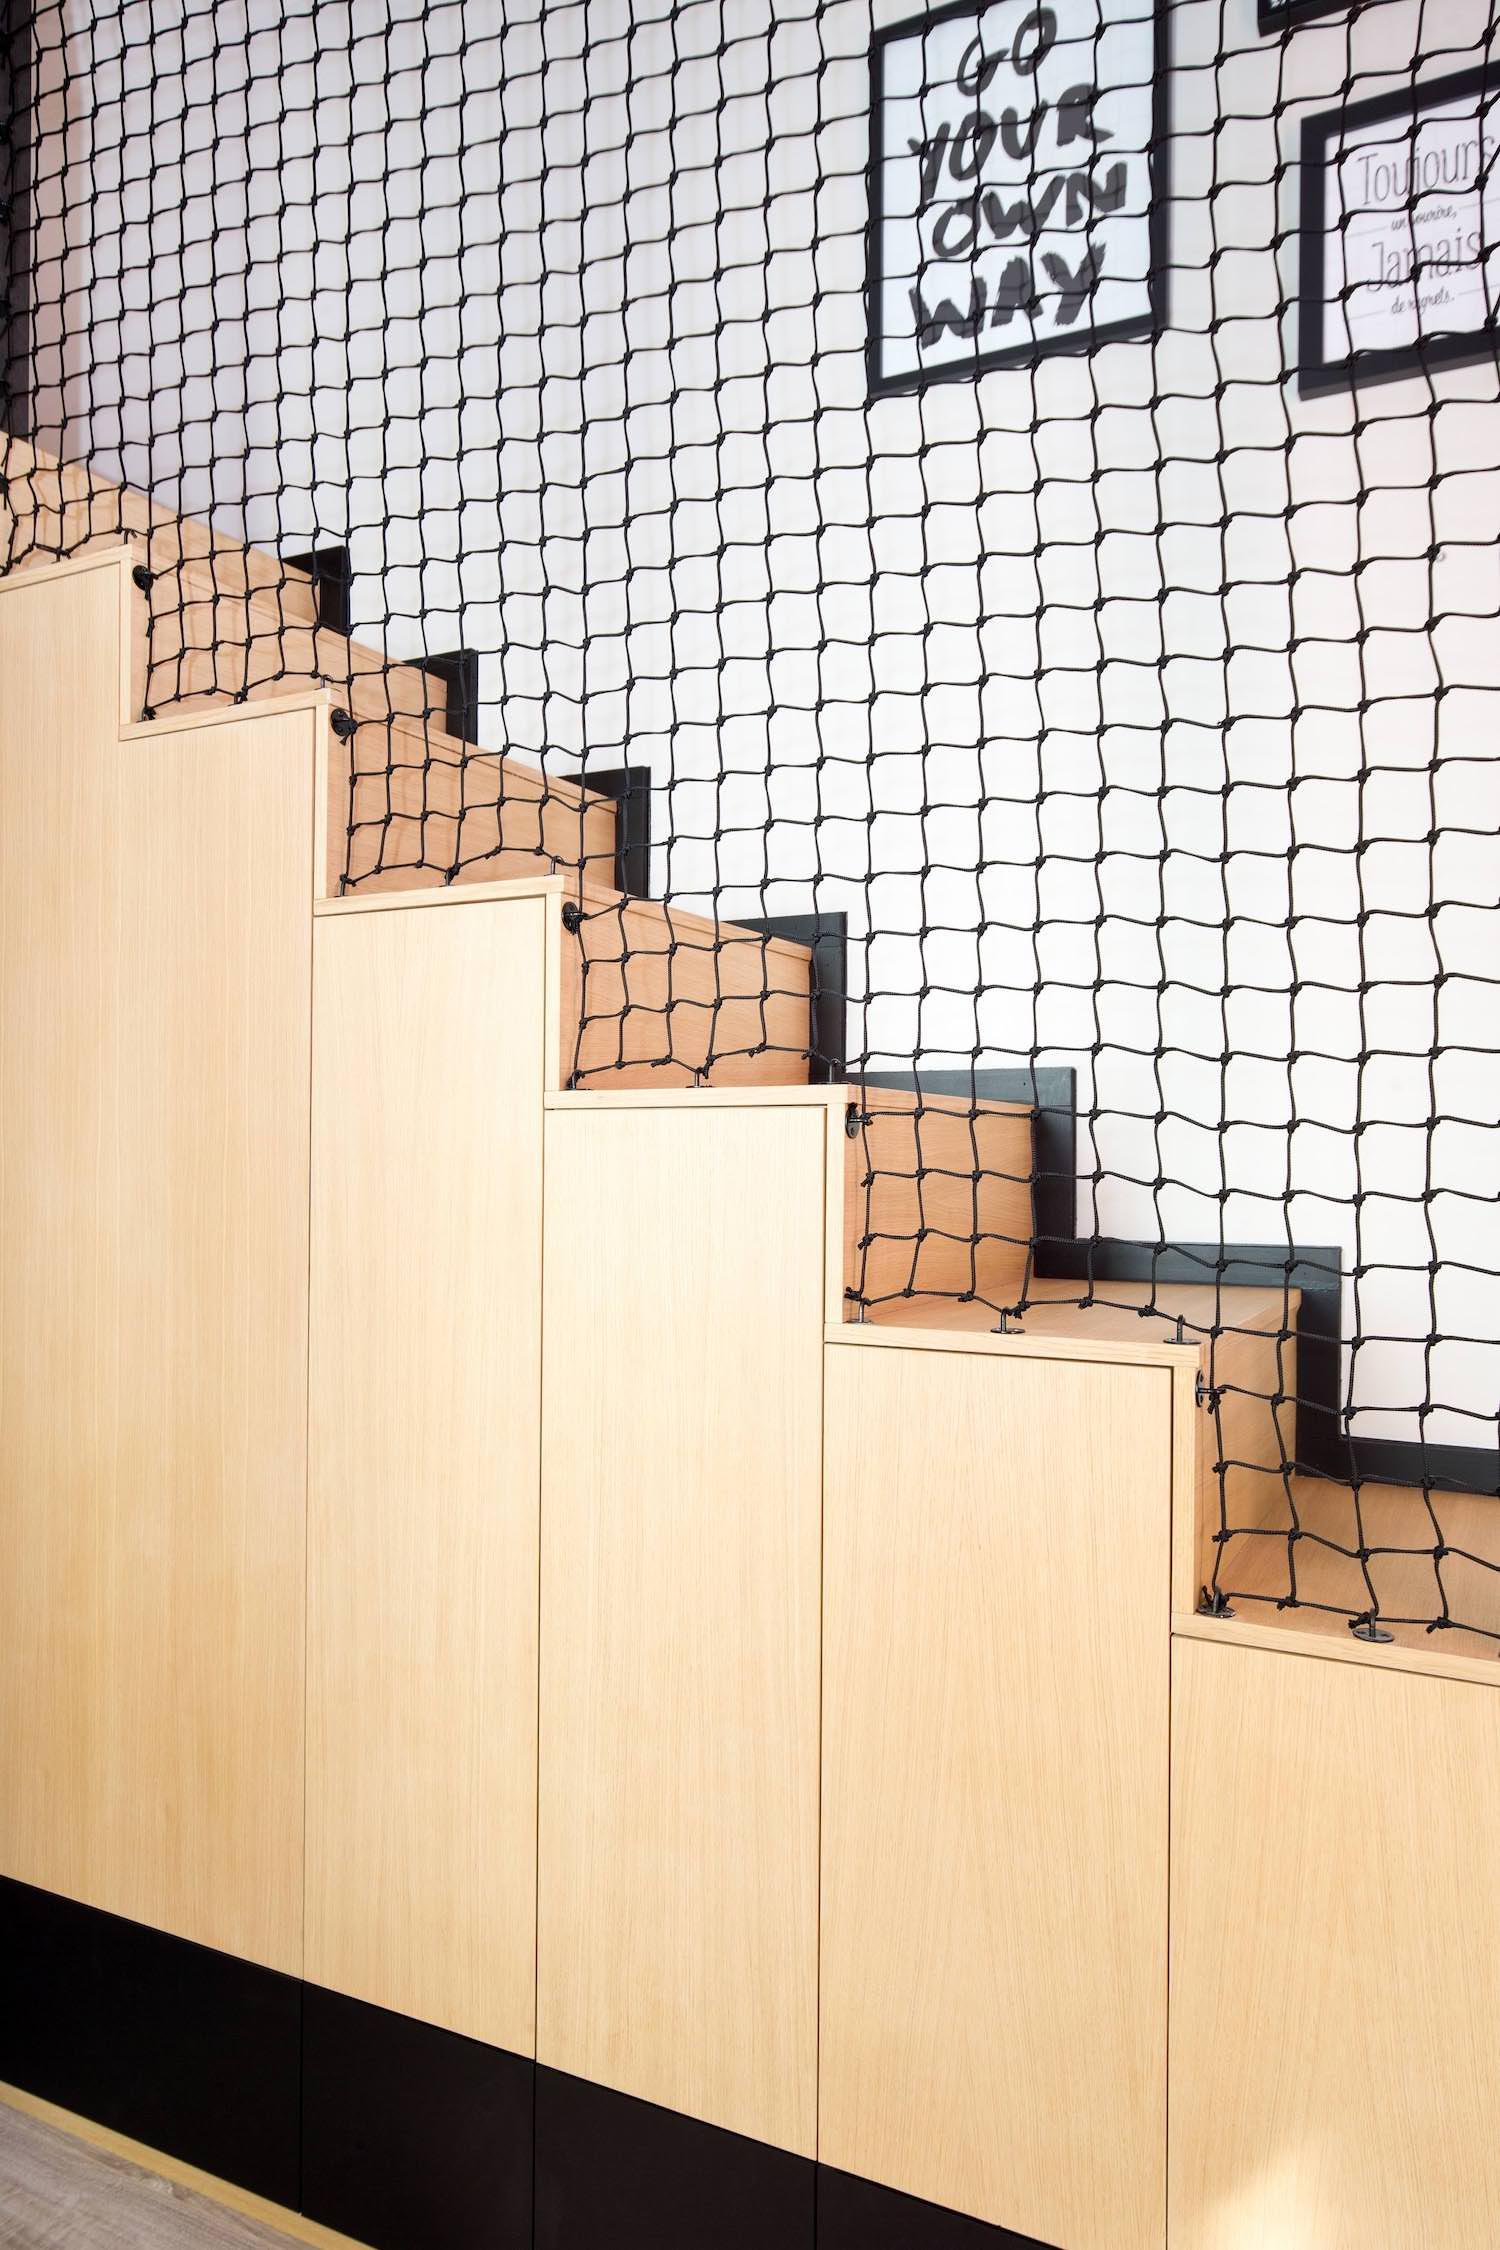 Escalier placards filet.jpg